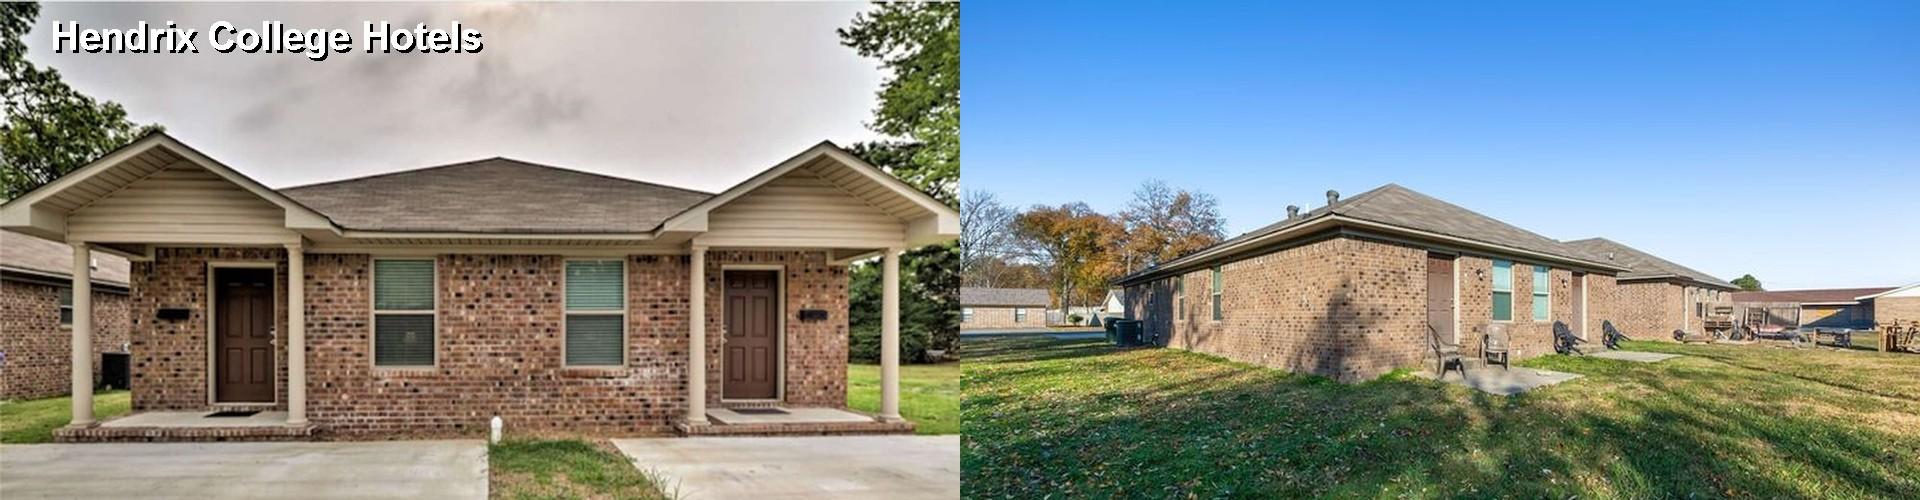 5 Best Hotels Near Hendrix College